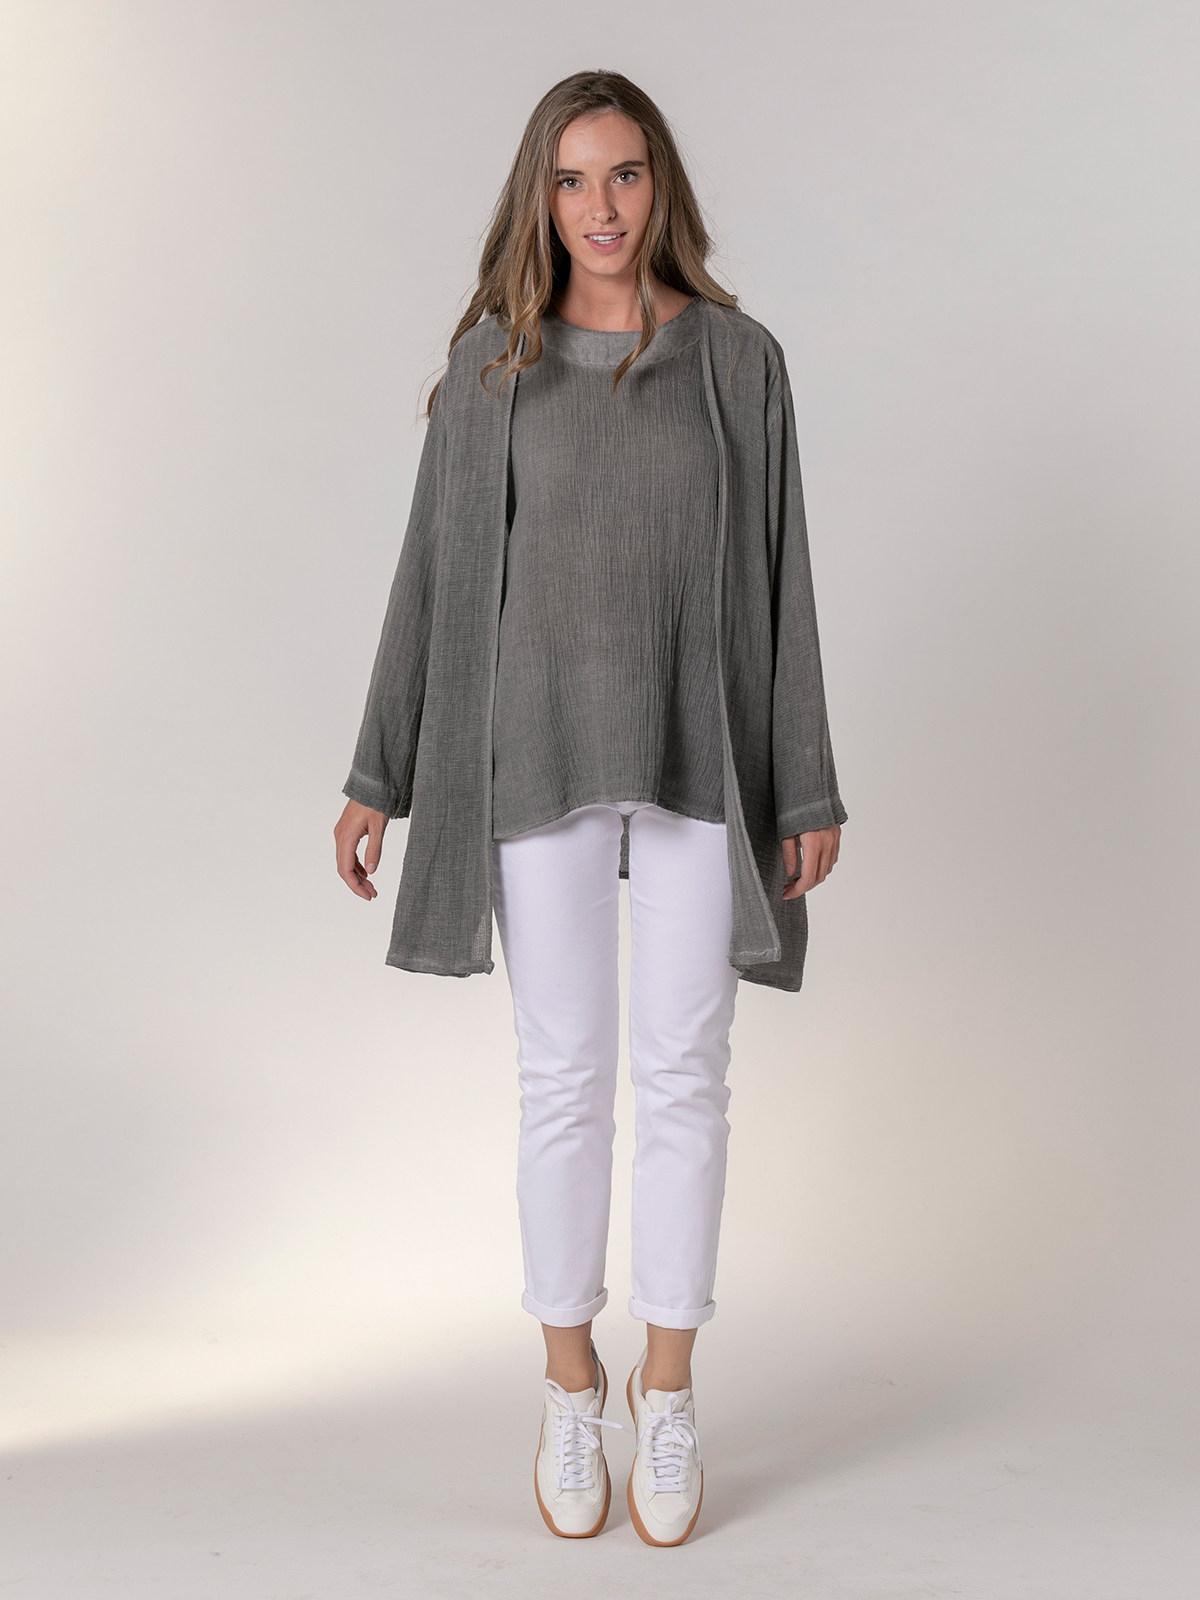 Chaqueta mujer oversize algodón lino Gris